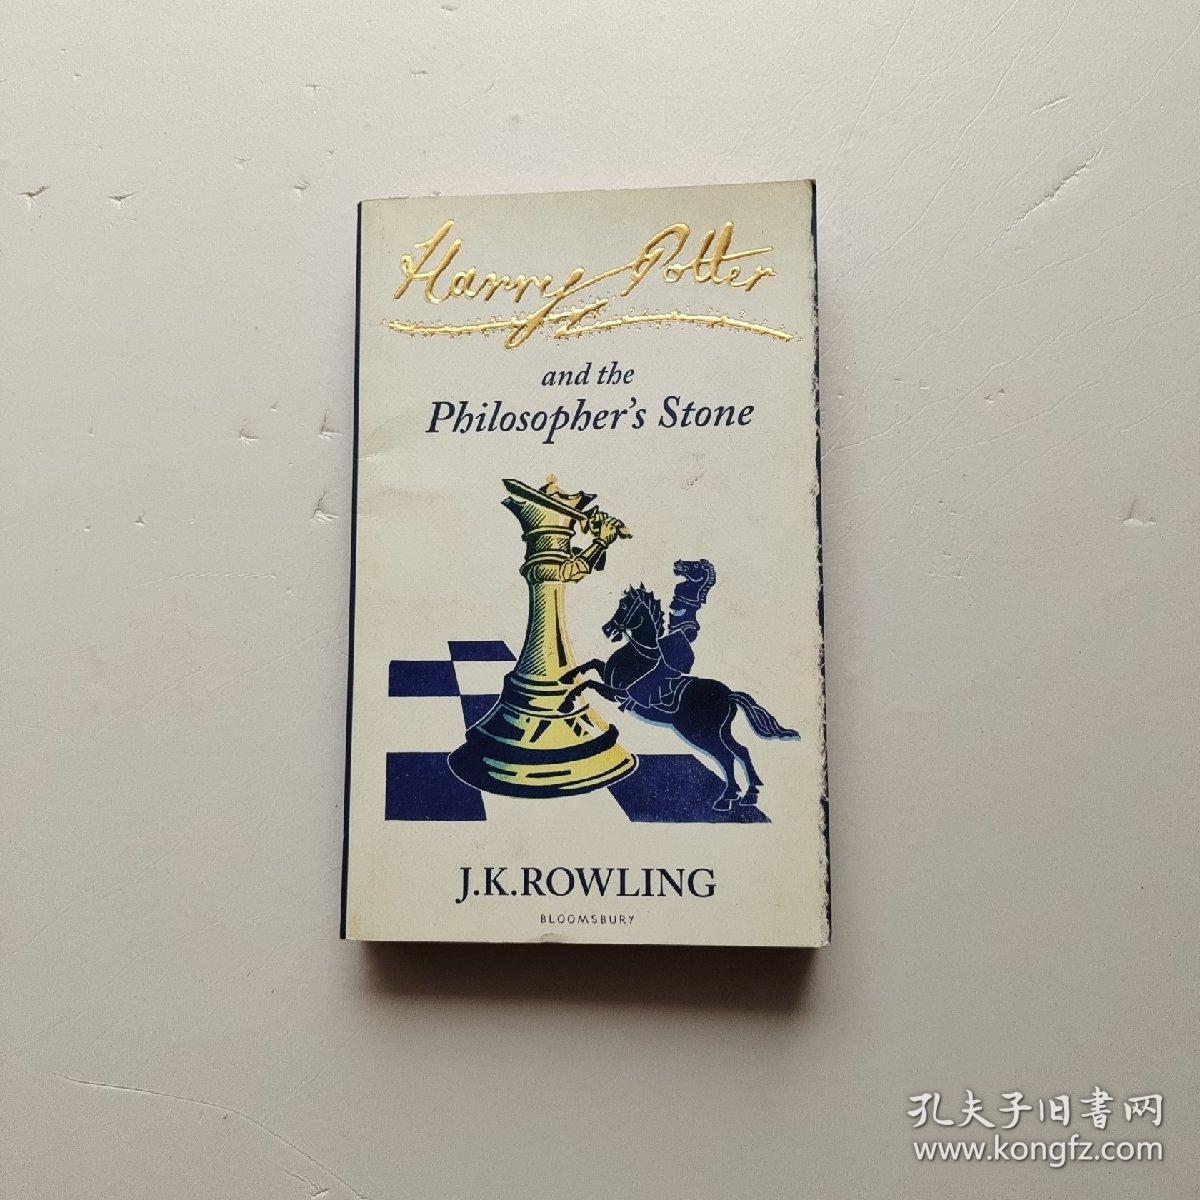 Harry Potter and the Philosopher's Stone哈利波特与魔法石